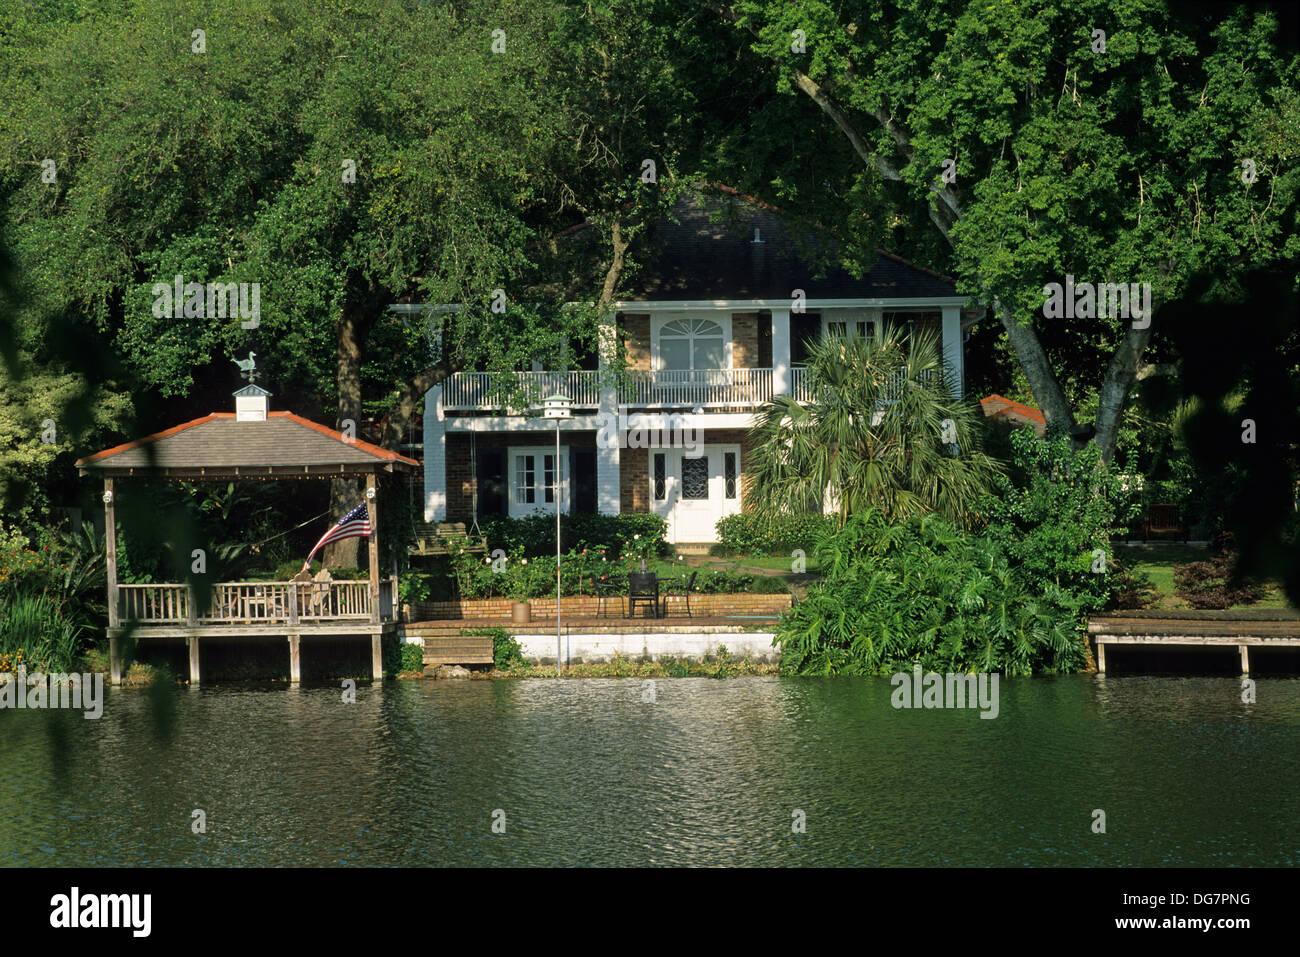 Haus am Fluss Mississippi Louisiana Vereinigte Staaten